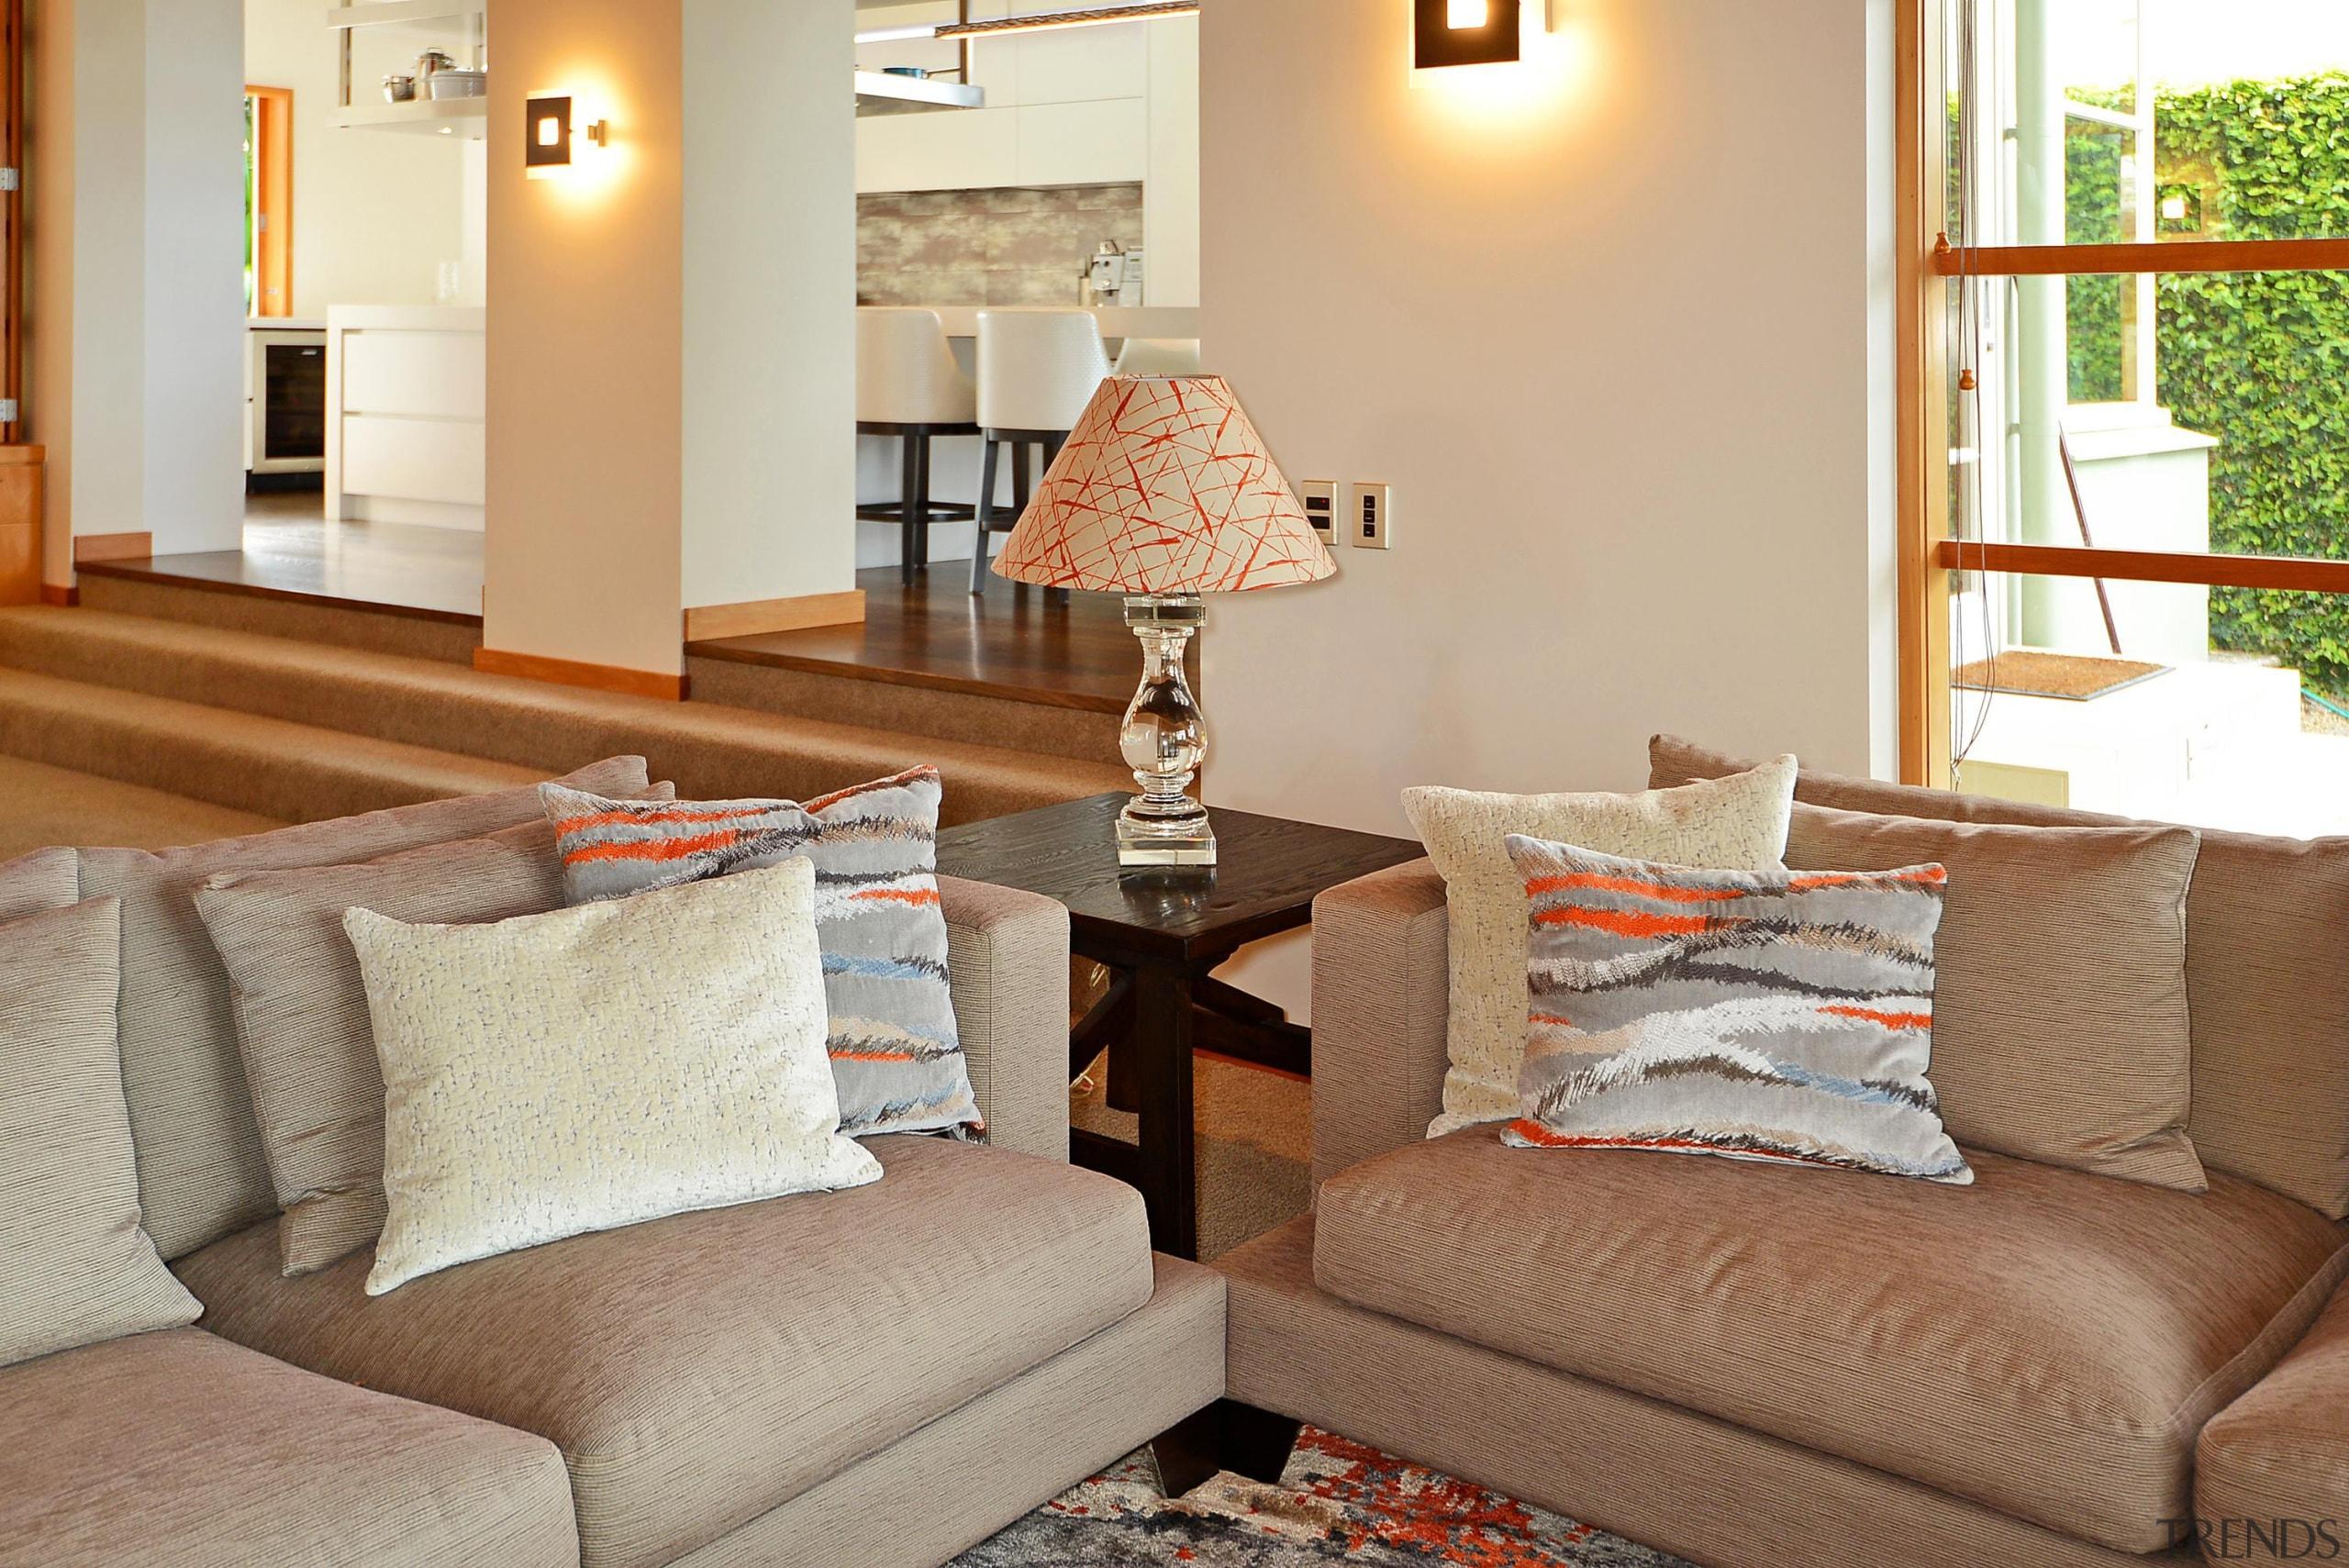 11 living space.jpg - 11_living_space.jpg - floor | floor, flooring, furniture, home, interior design, living room, real estate, room, gray, brown